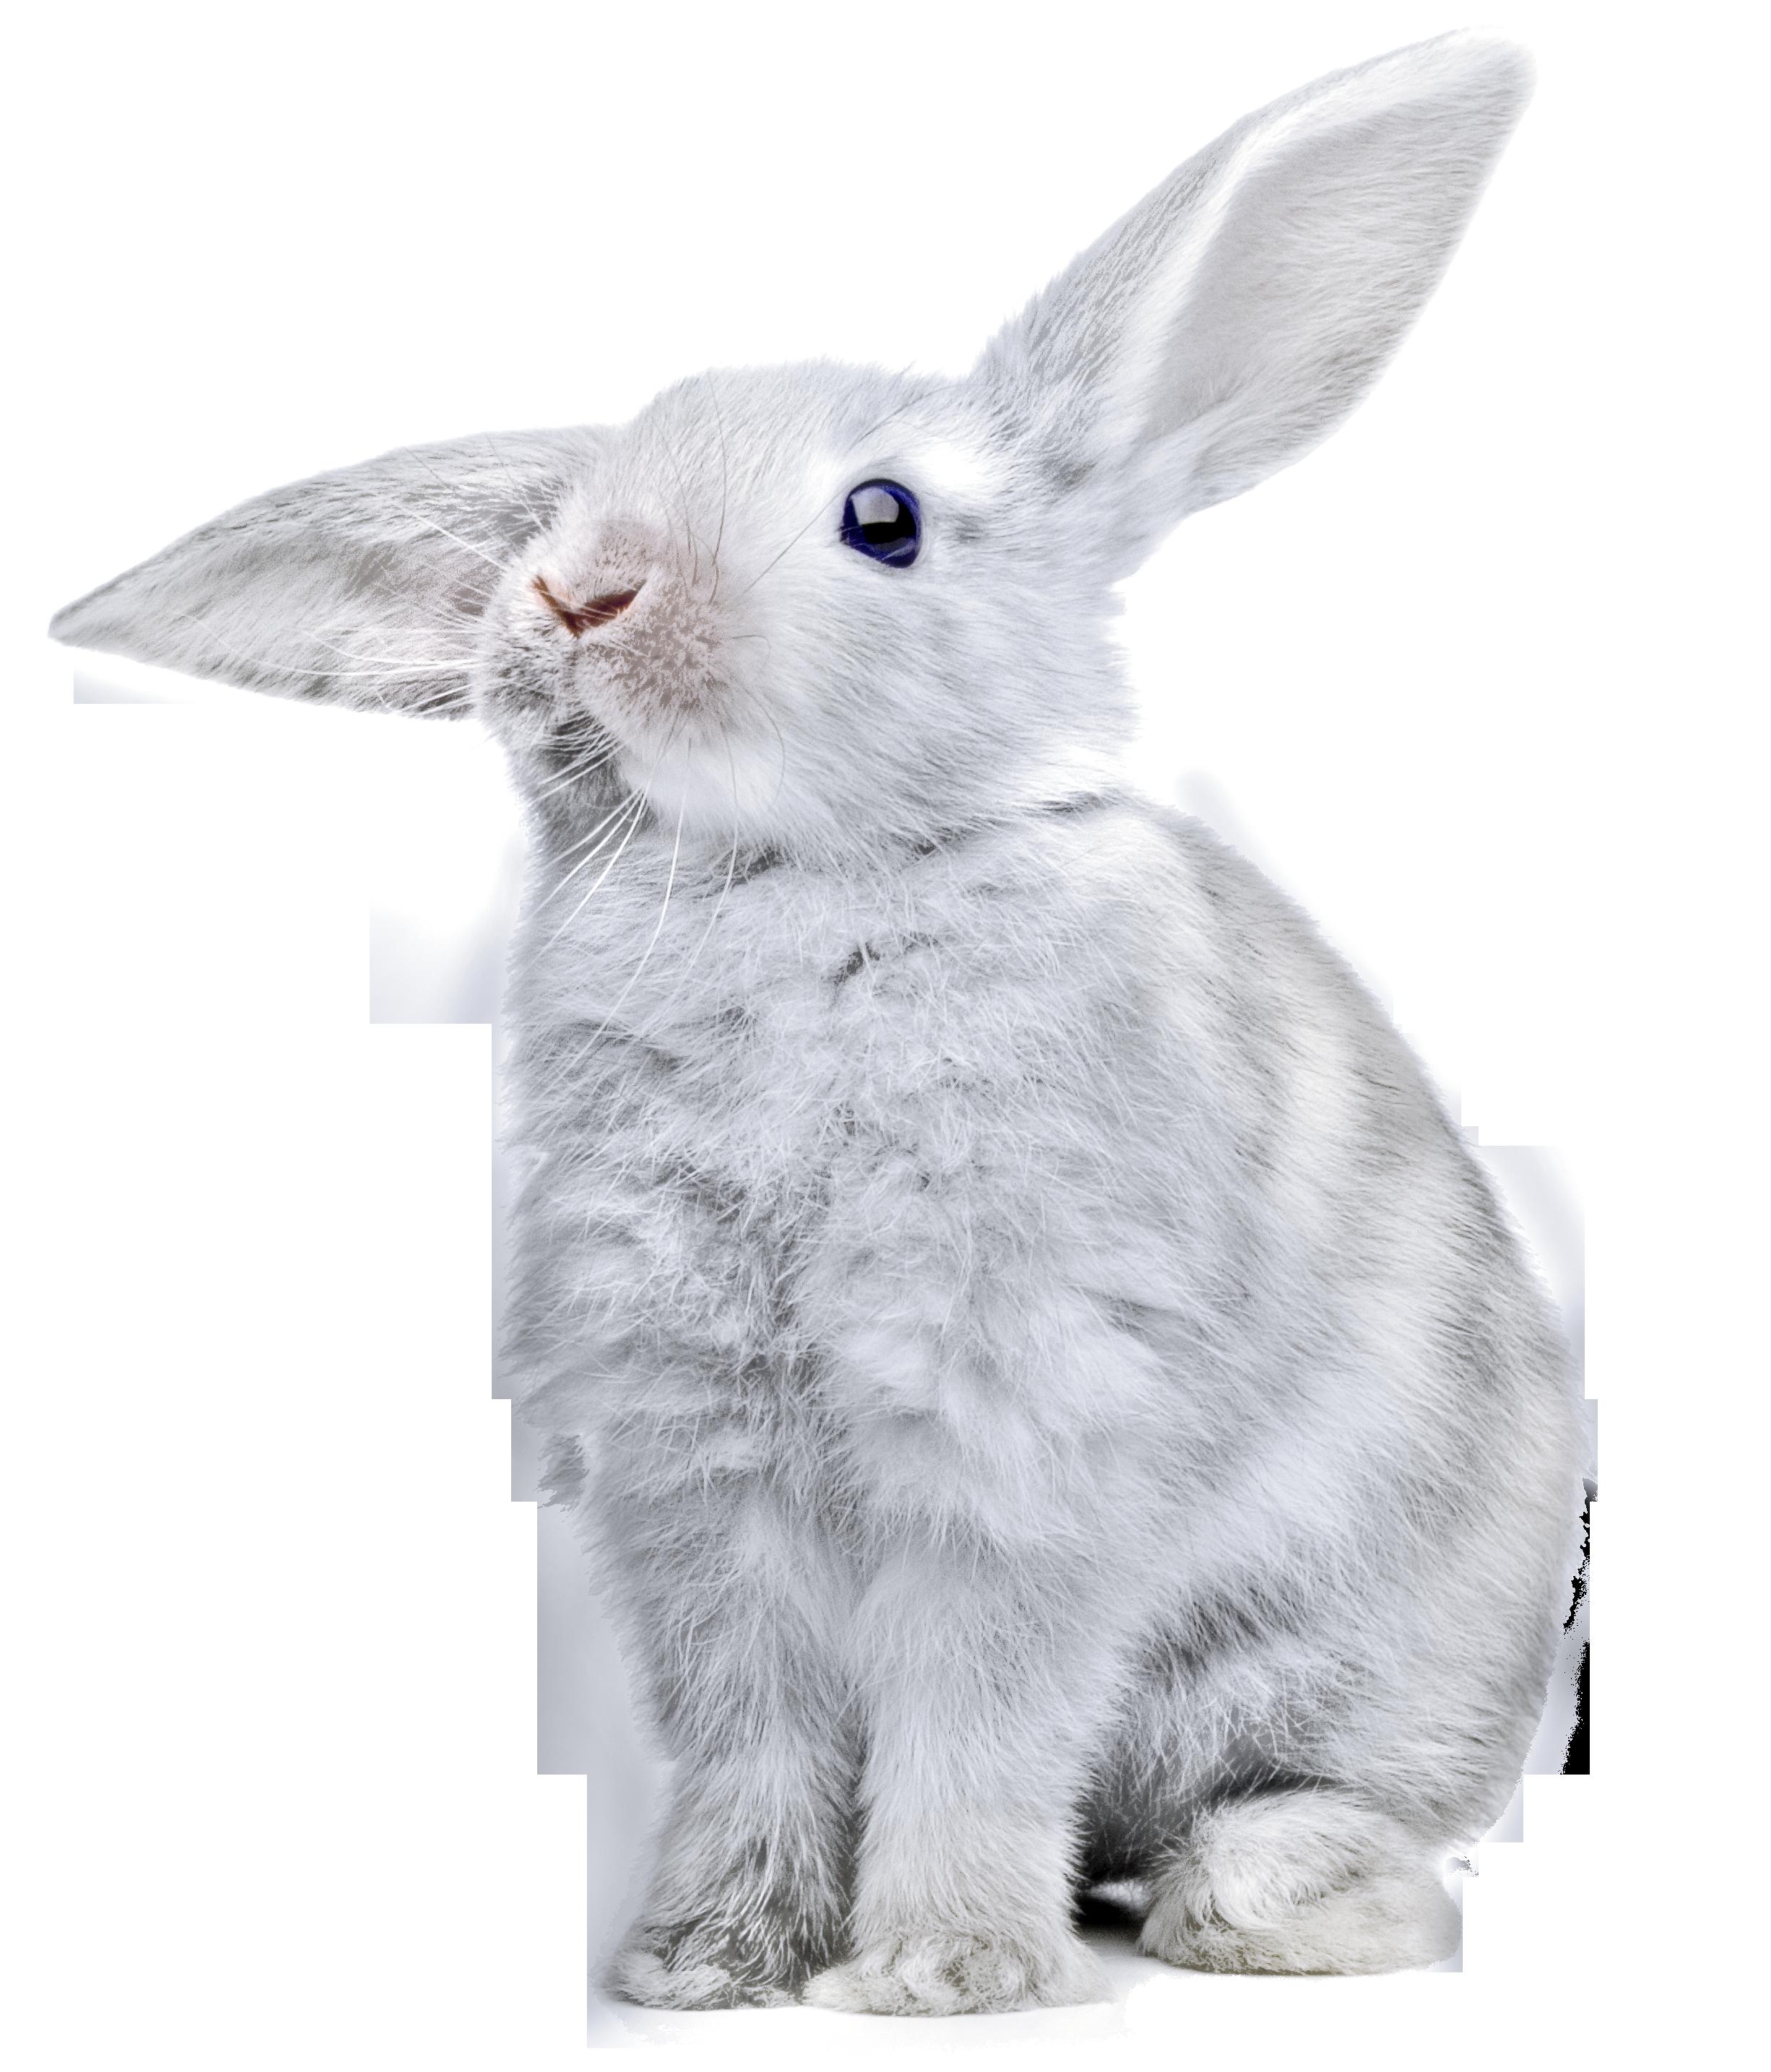 Rabbit PNG - 2868